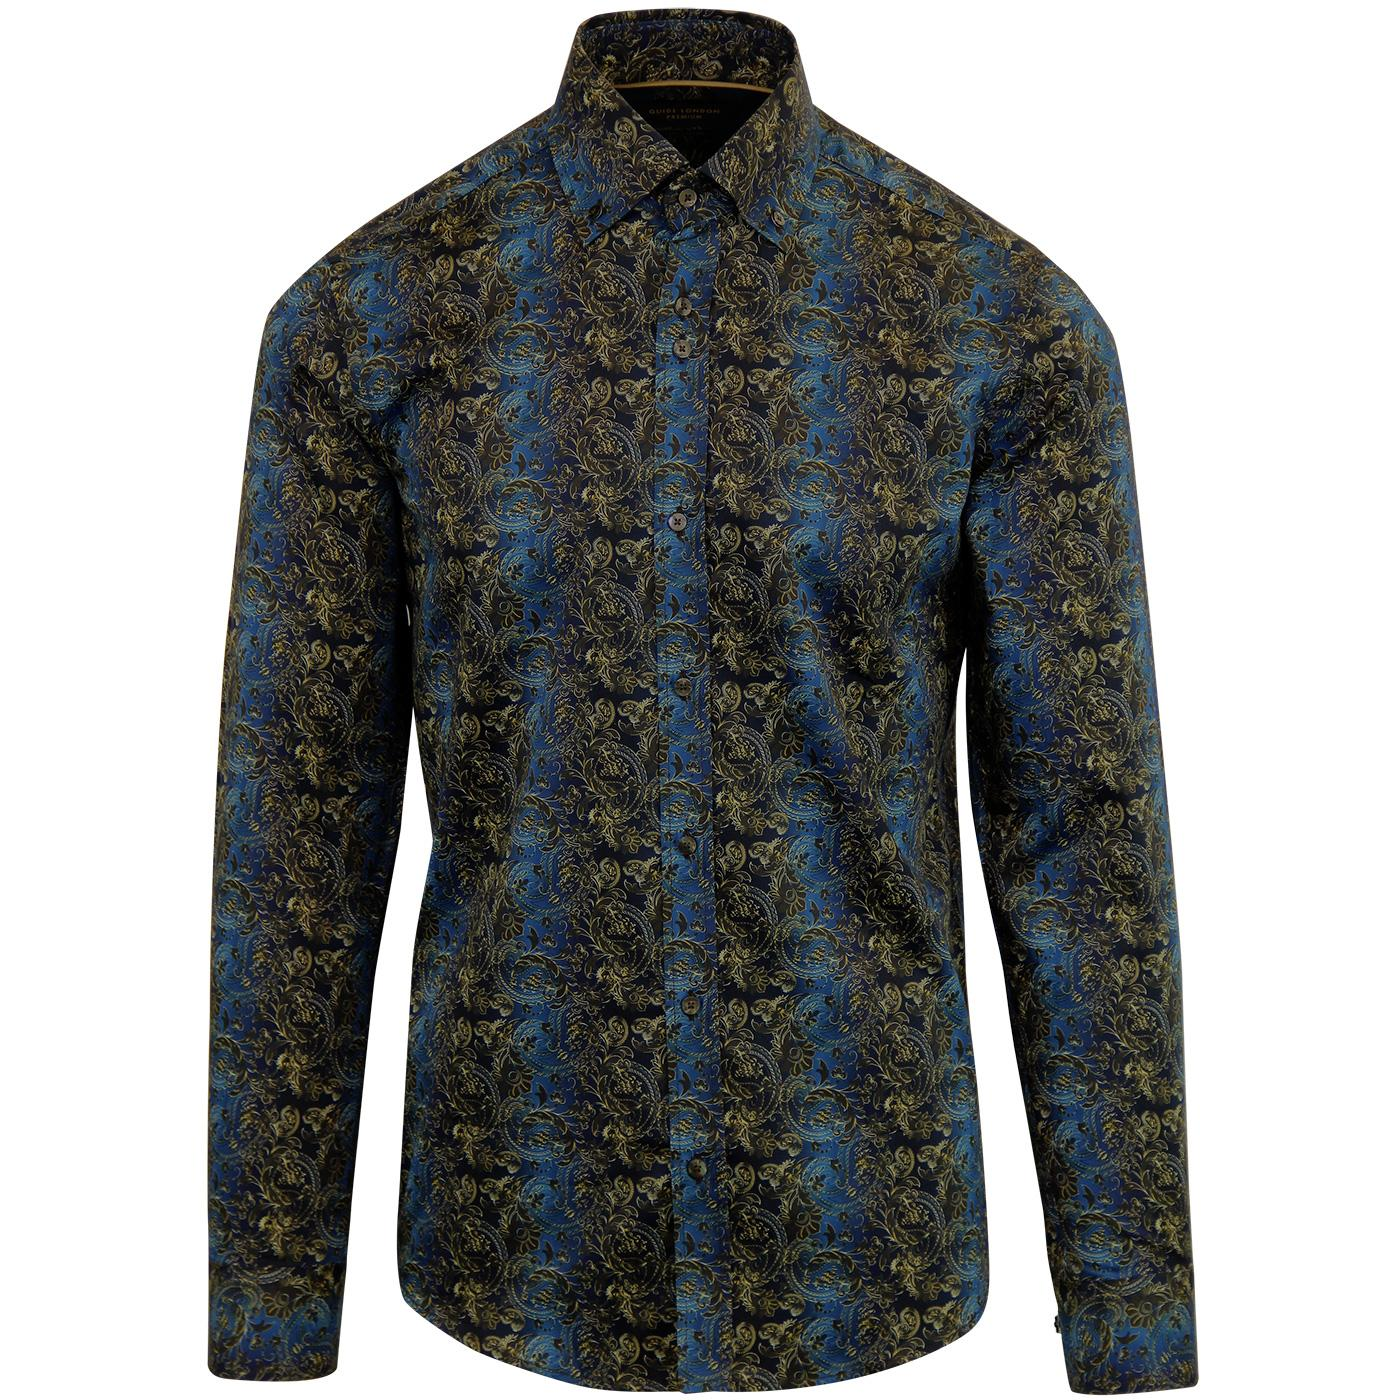 GUIDE LONDON Men's Retro Mod Sateen Paisley Shirt